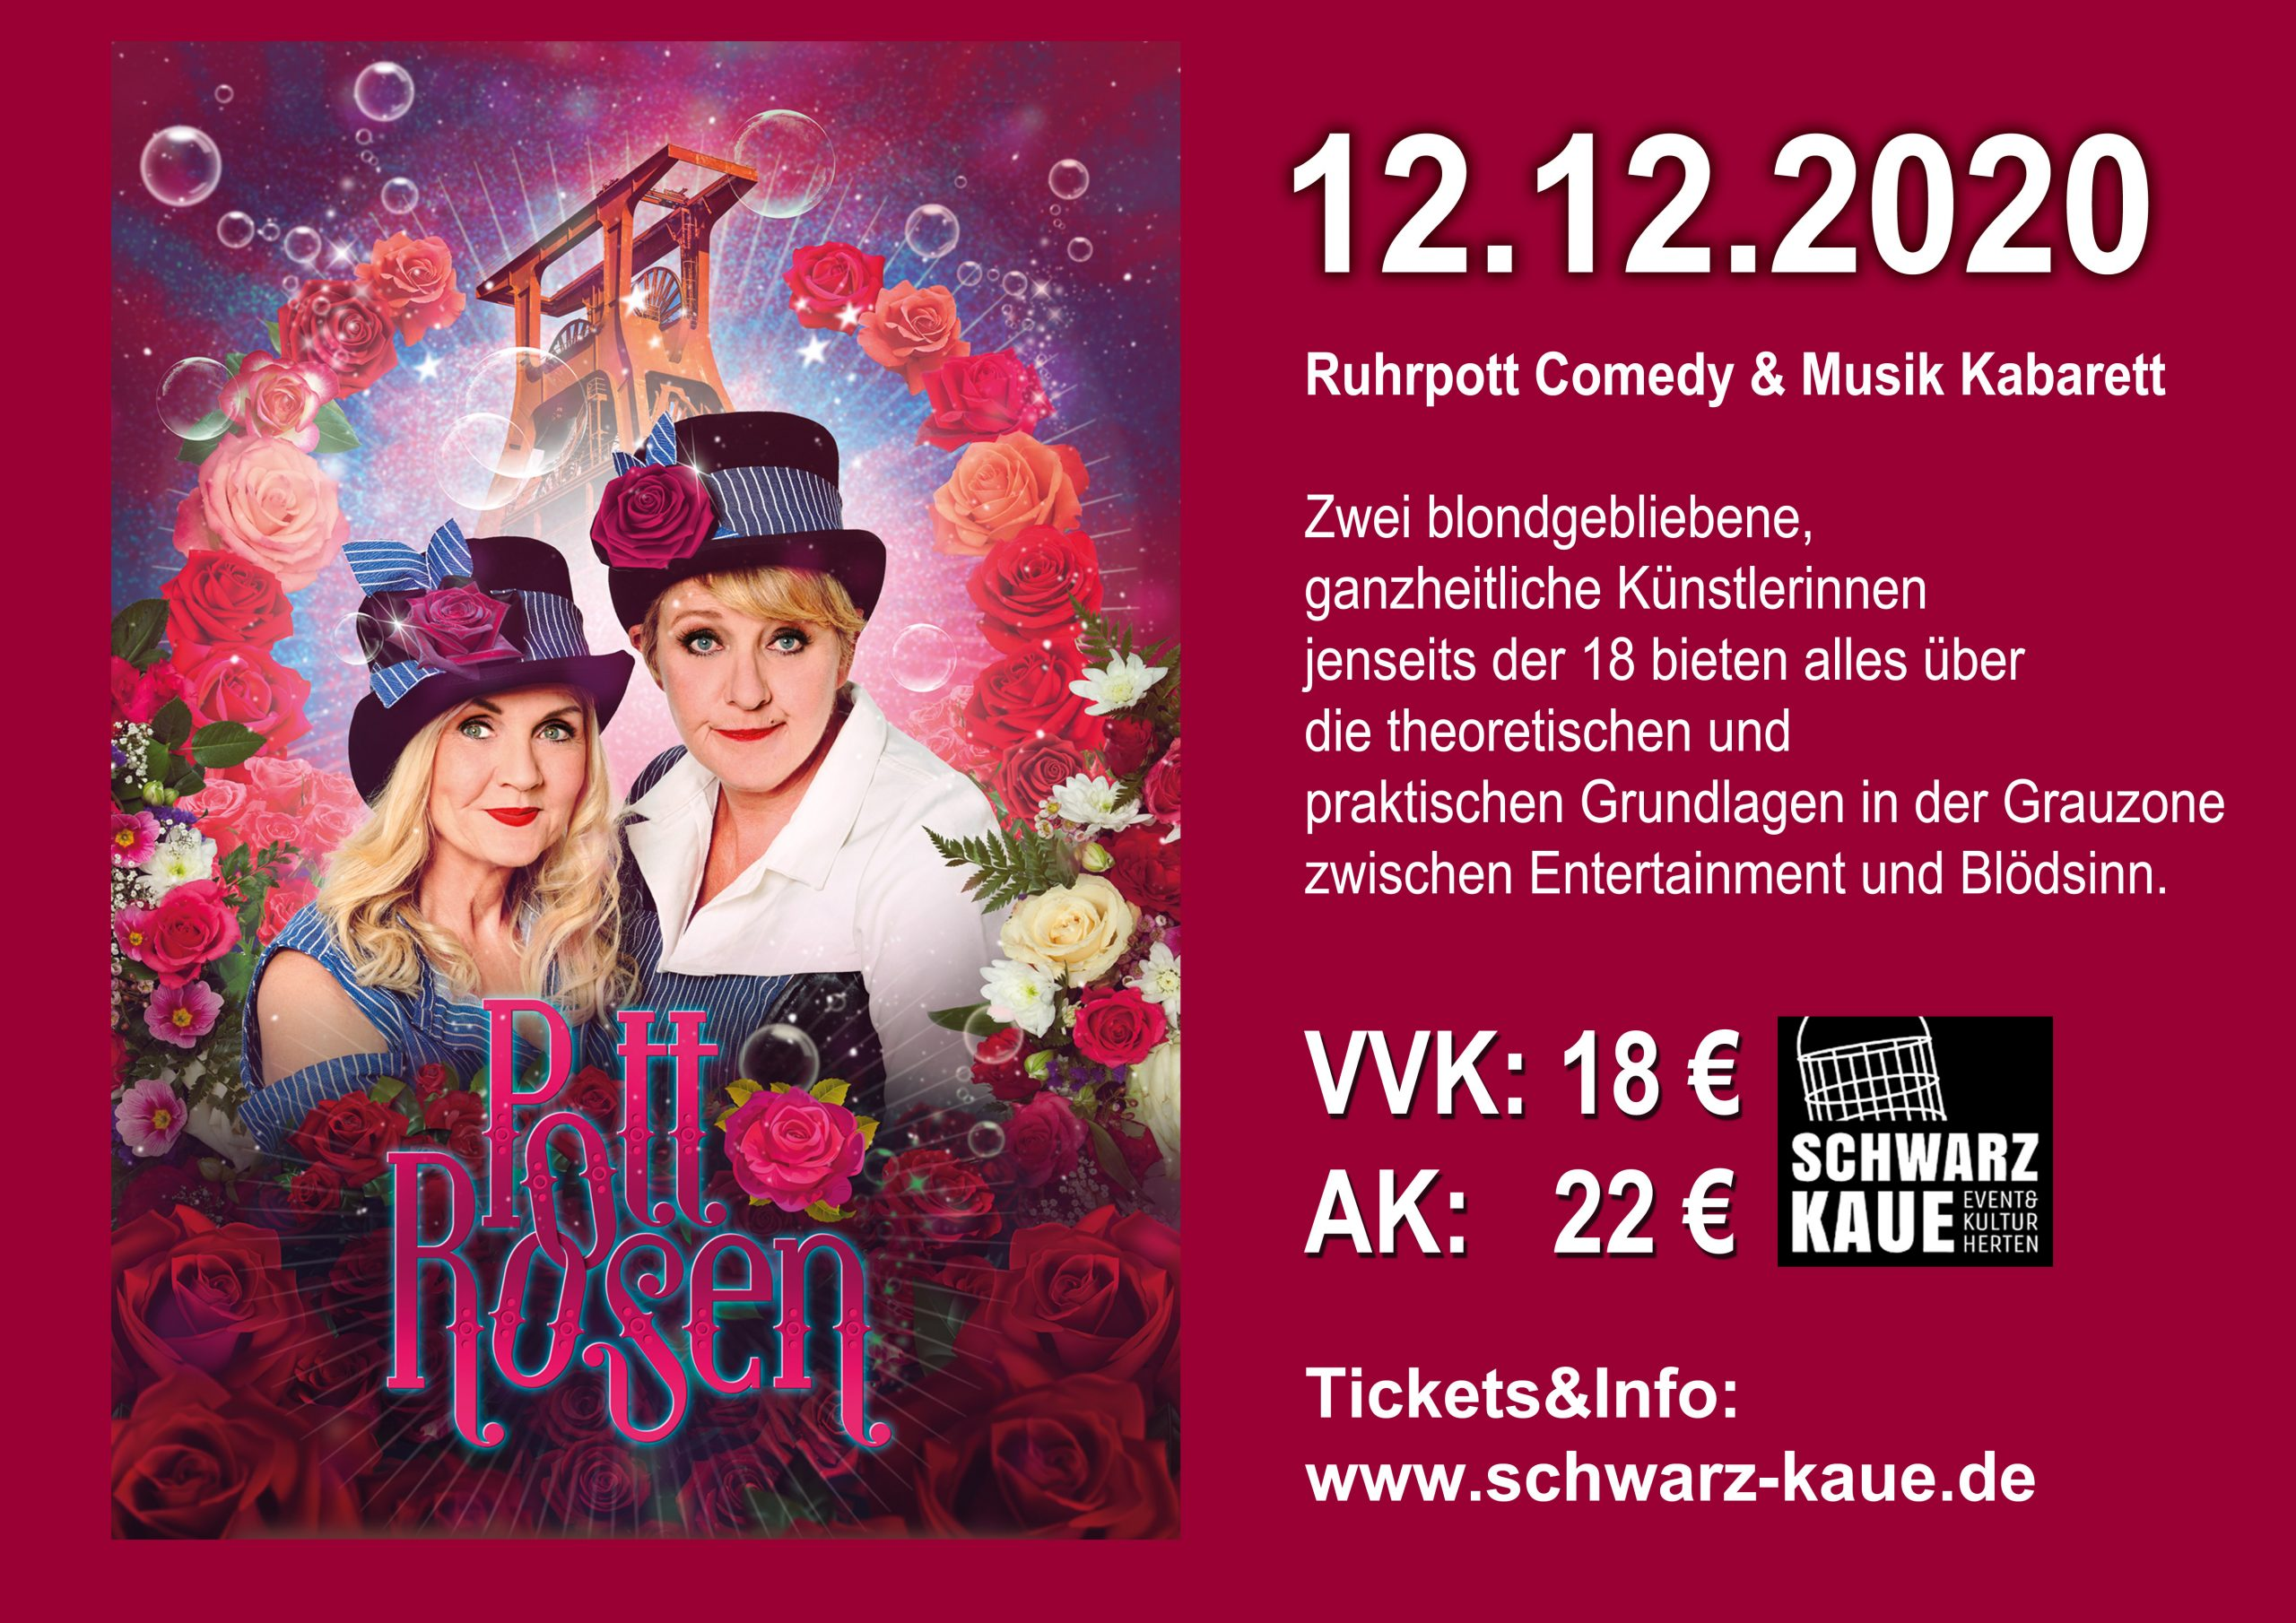 Ruhrpott Comedy